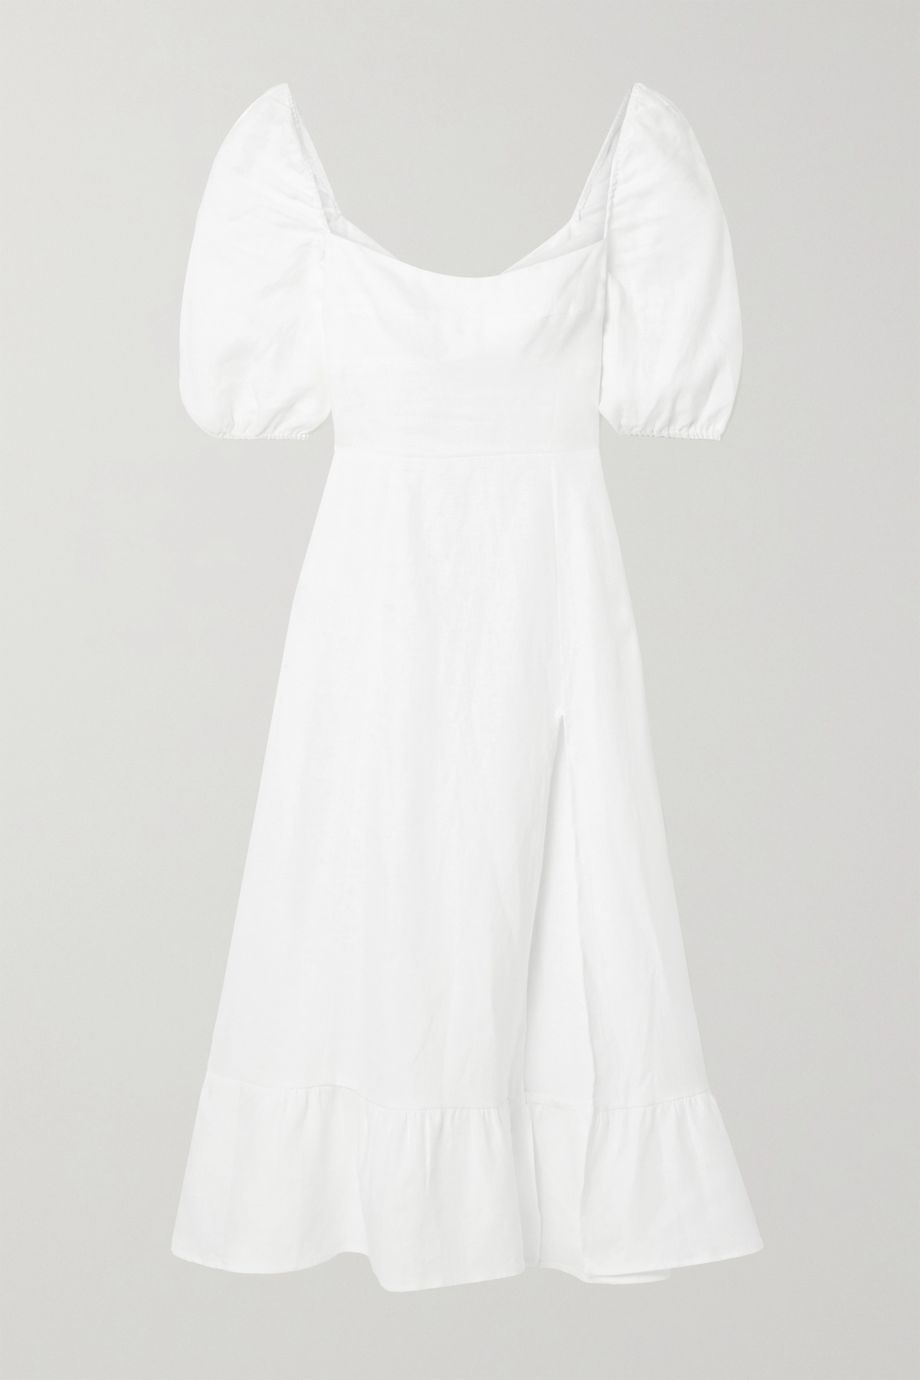 Reformation Belgium linen midi dress